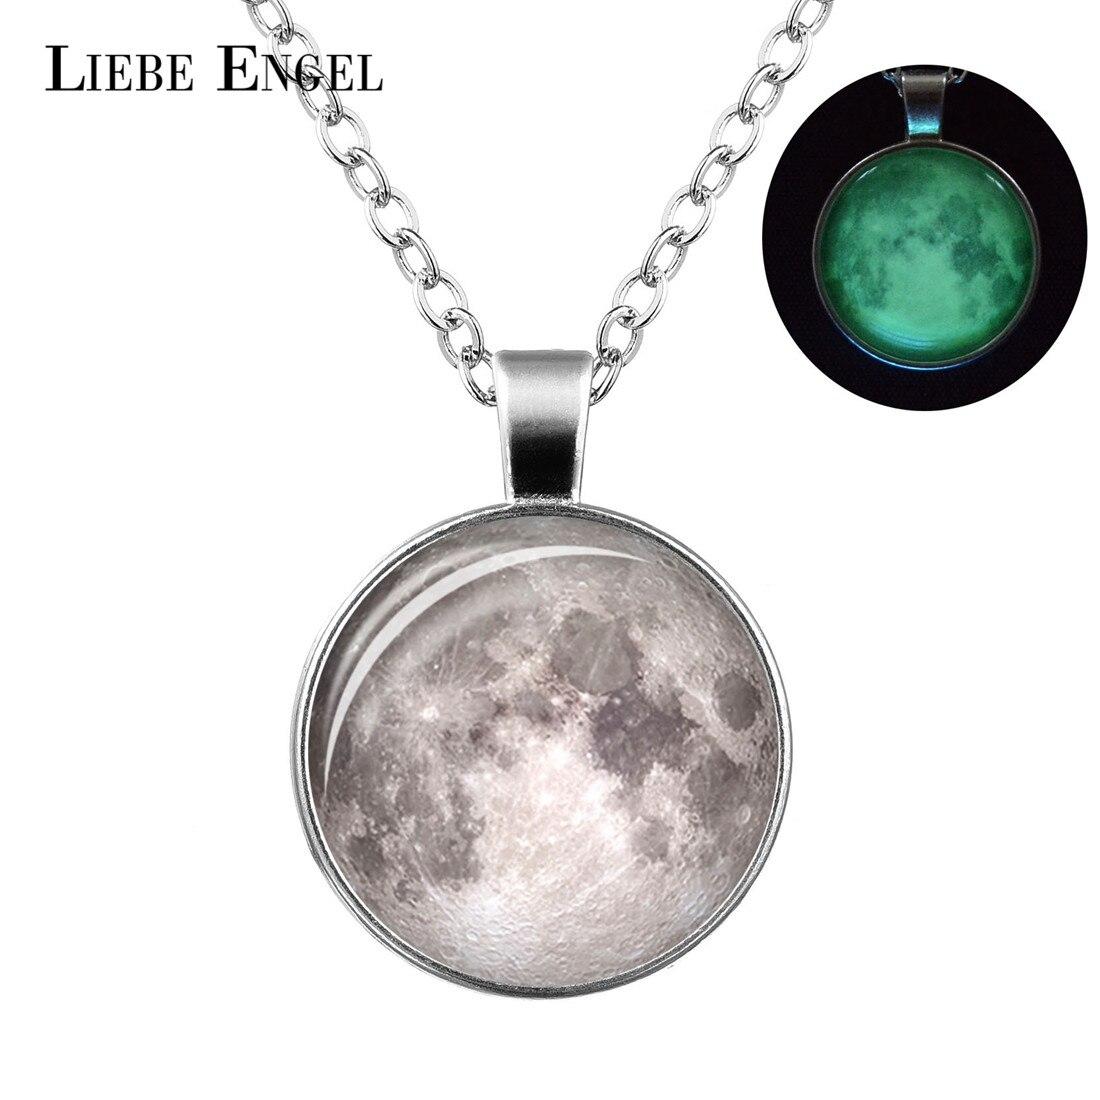 liebe-engel-glowing-in-the-dark-galaxy-moon-pendant-necklace-for-women-fontbjewelry-b-font-luminous-